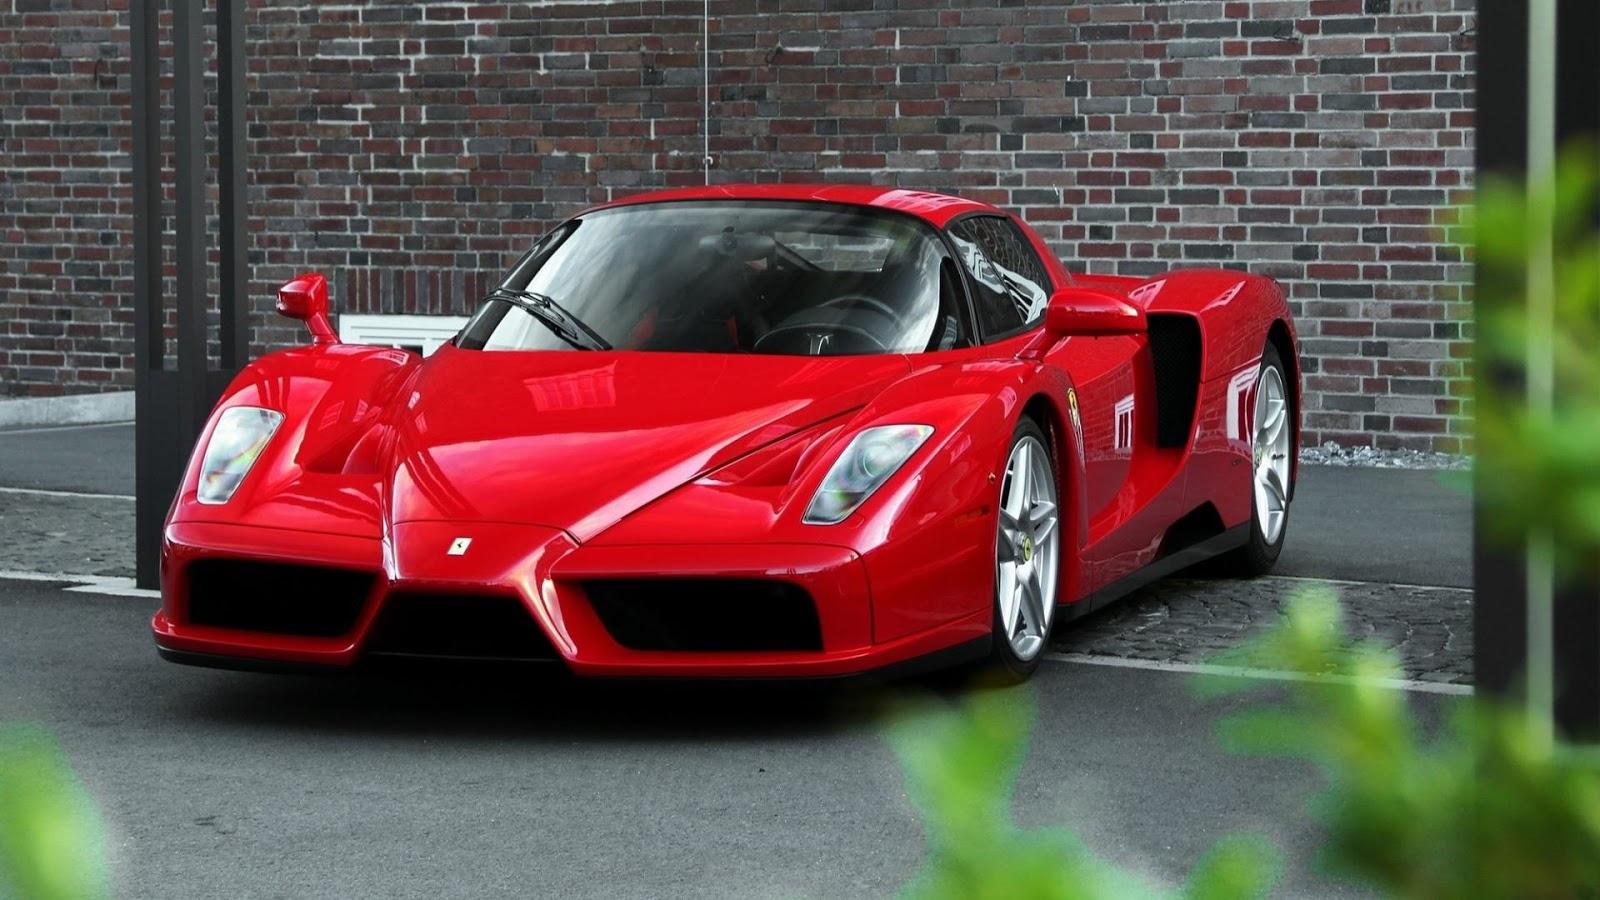 Gambar Transportasi  Gambar Mobil Sport Ferrari Enzo